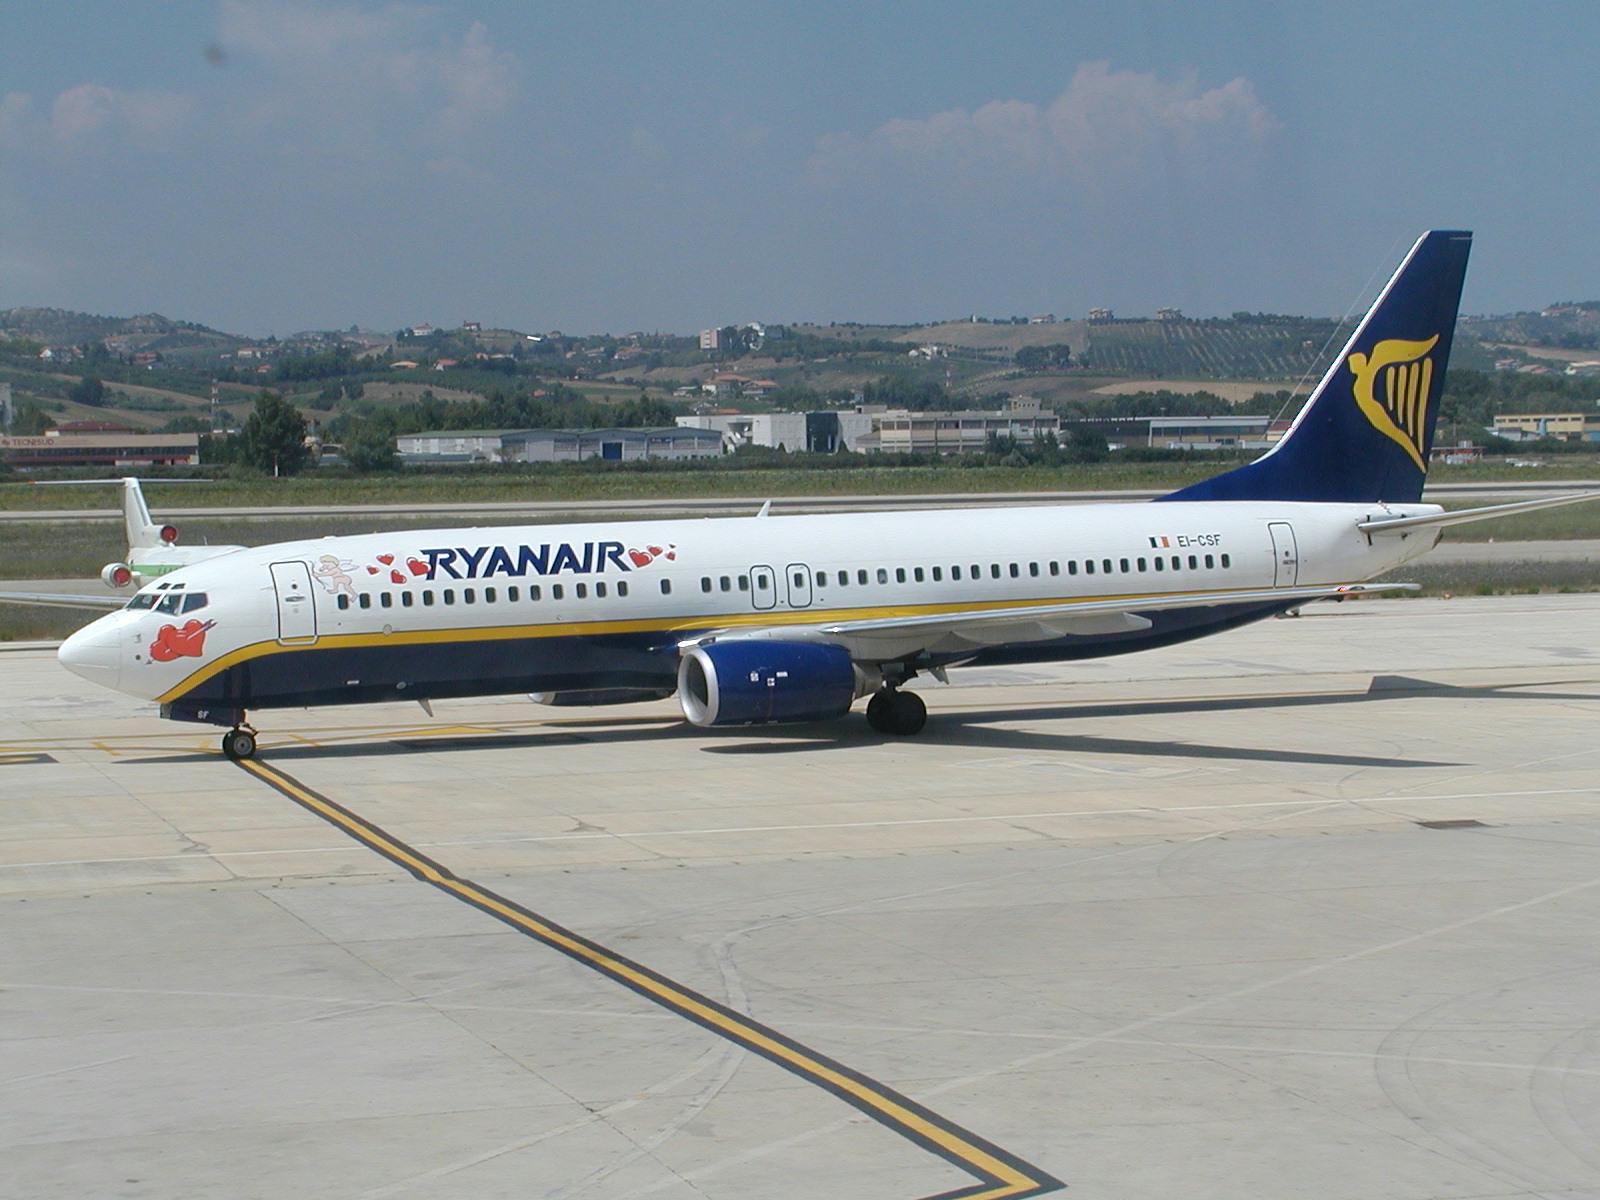 Aeroporti collegati Ryanair Milano Malpensa